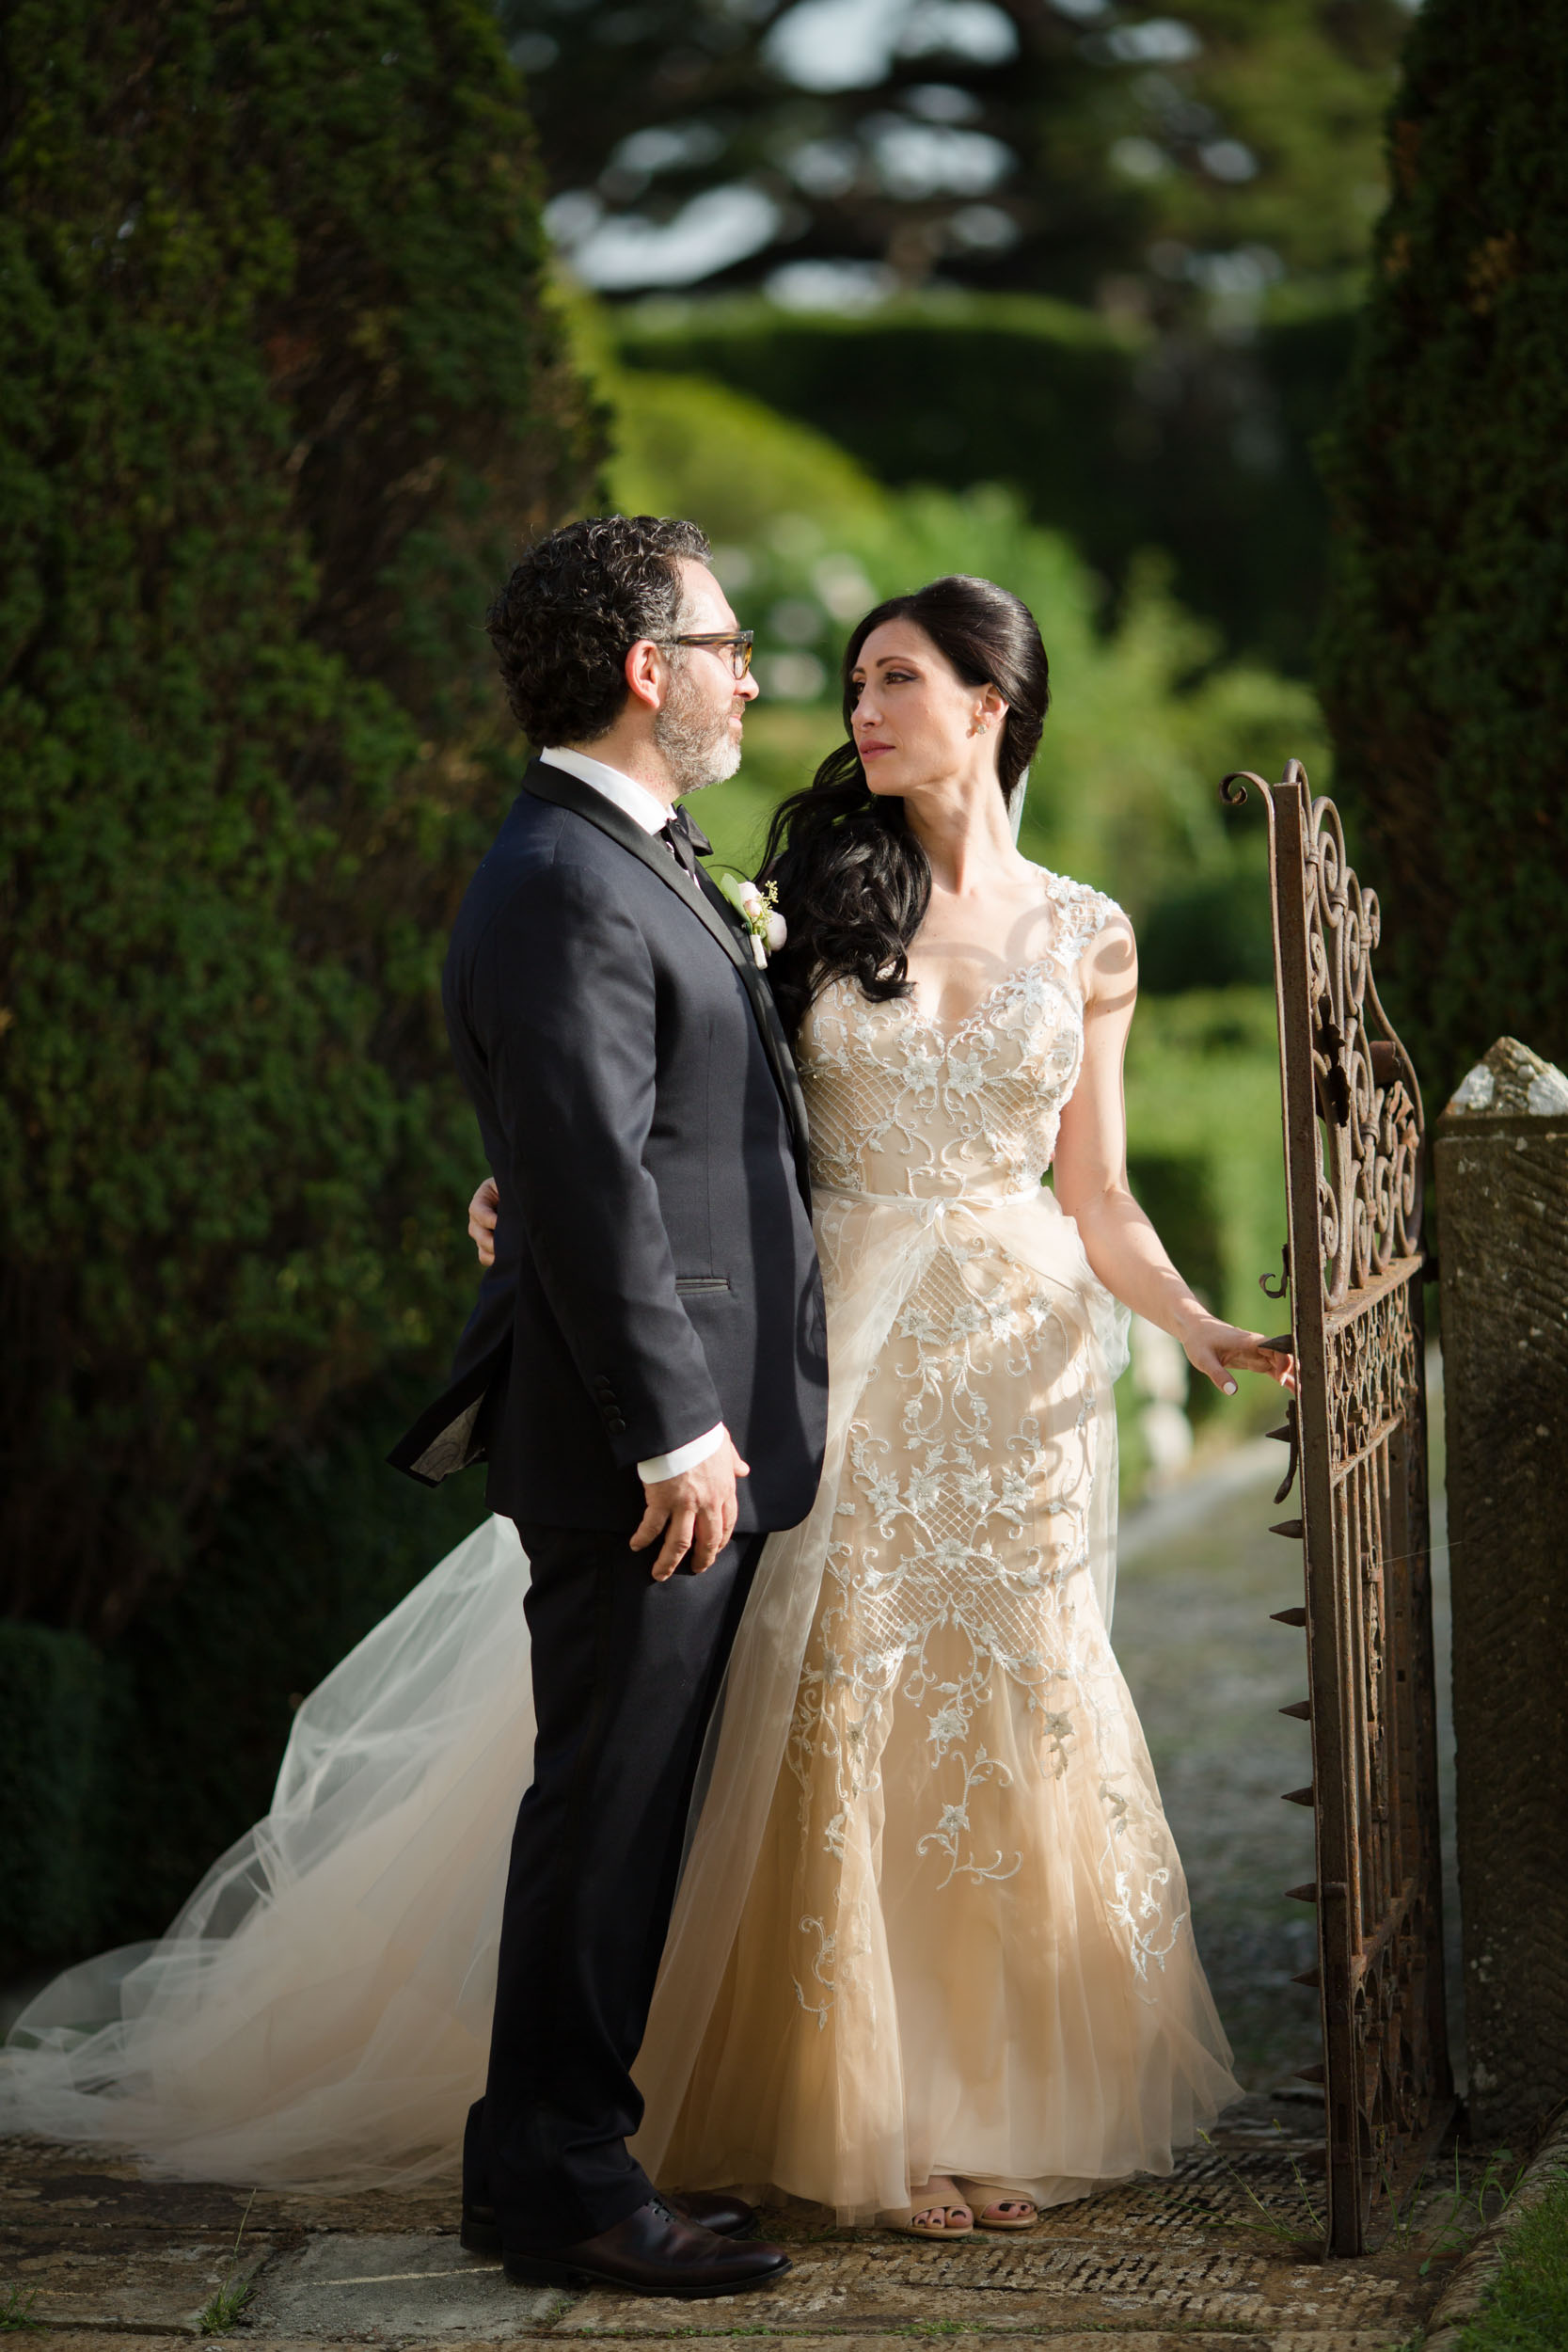 villa-gamberaia-florence-italy-destination-wedding-55.jpg